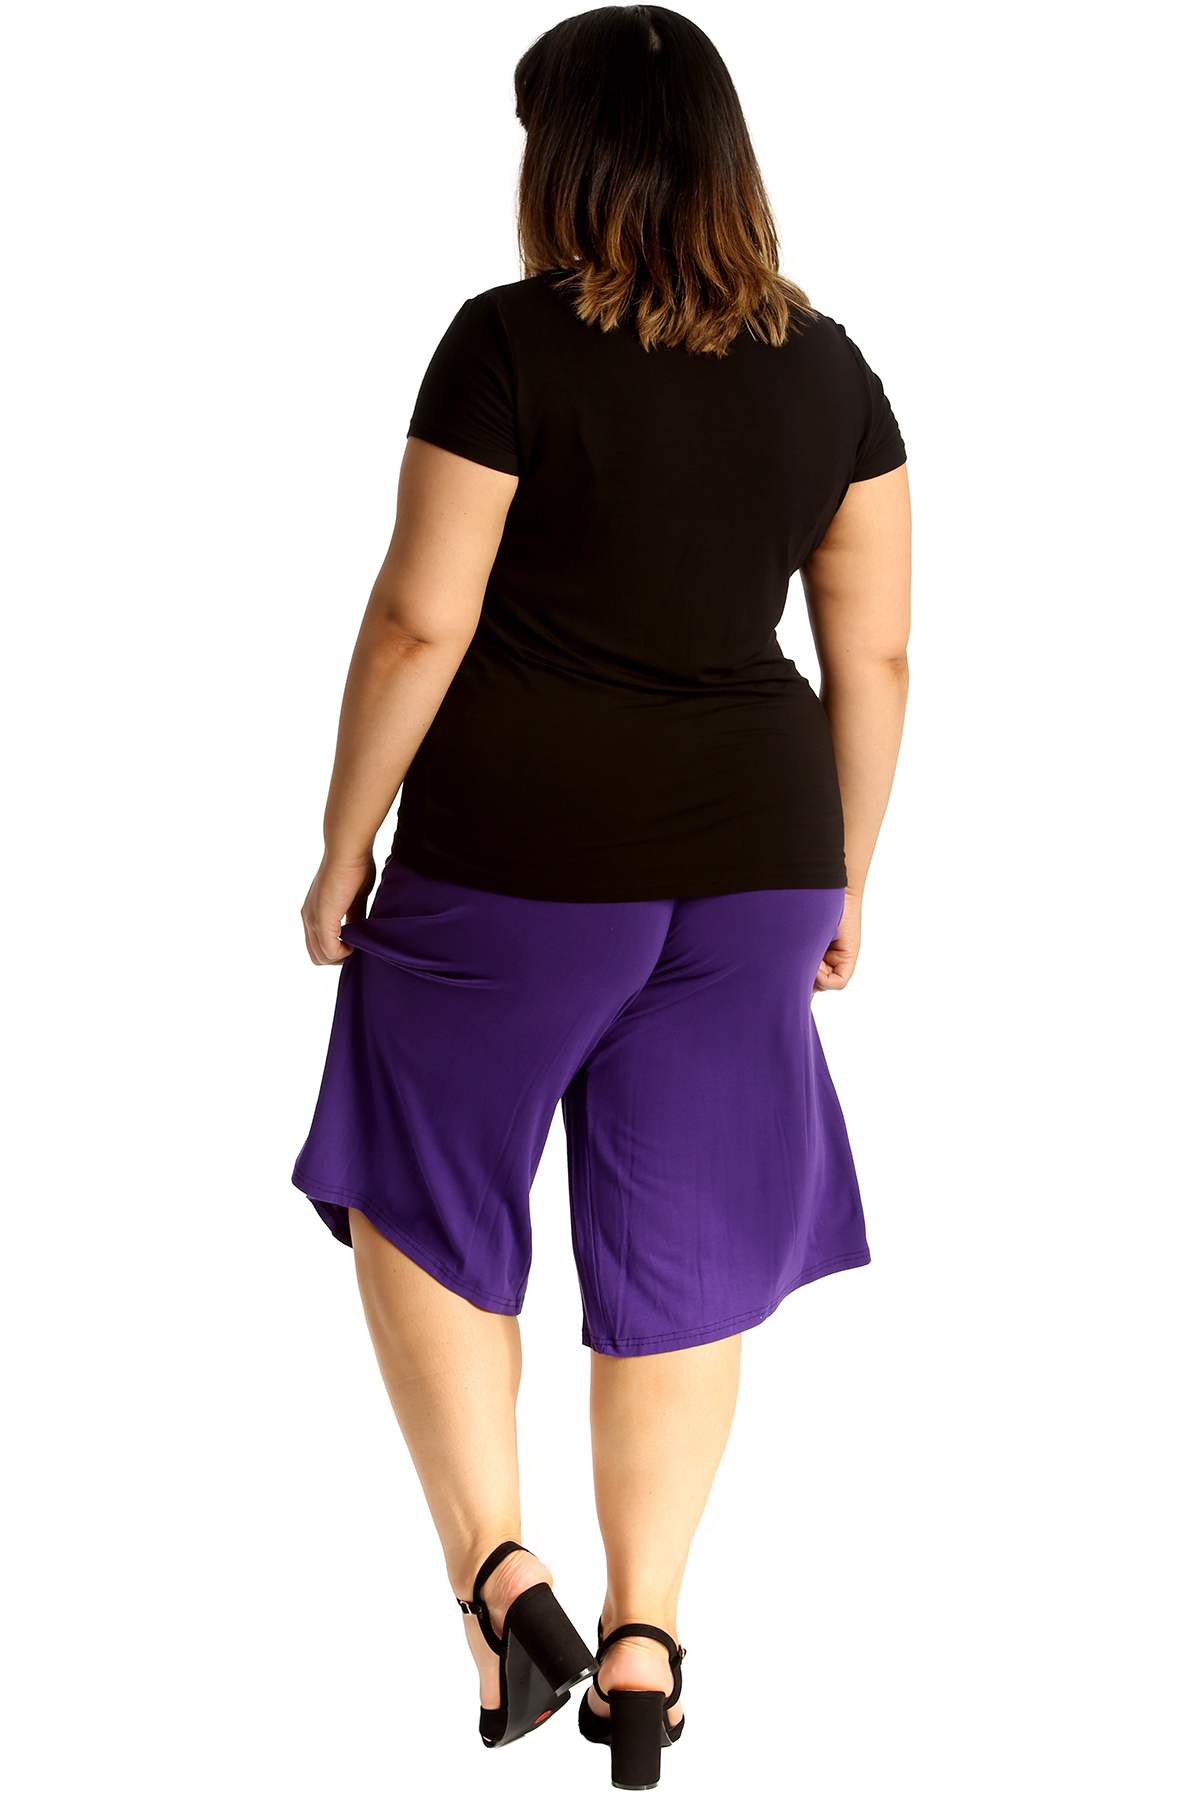 New-Womens-Plus-Size-Culottes-Ladies-Plain-Shorts-Palazzo-Elastic-Pants-Summer thumbnail 32